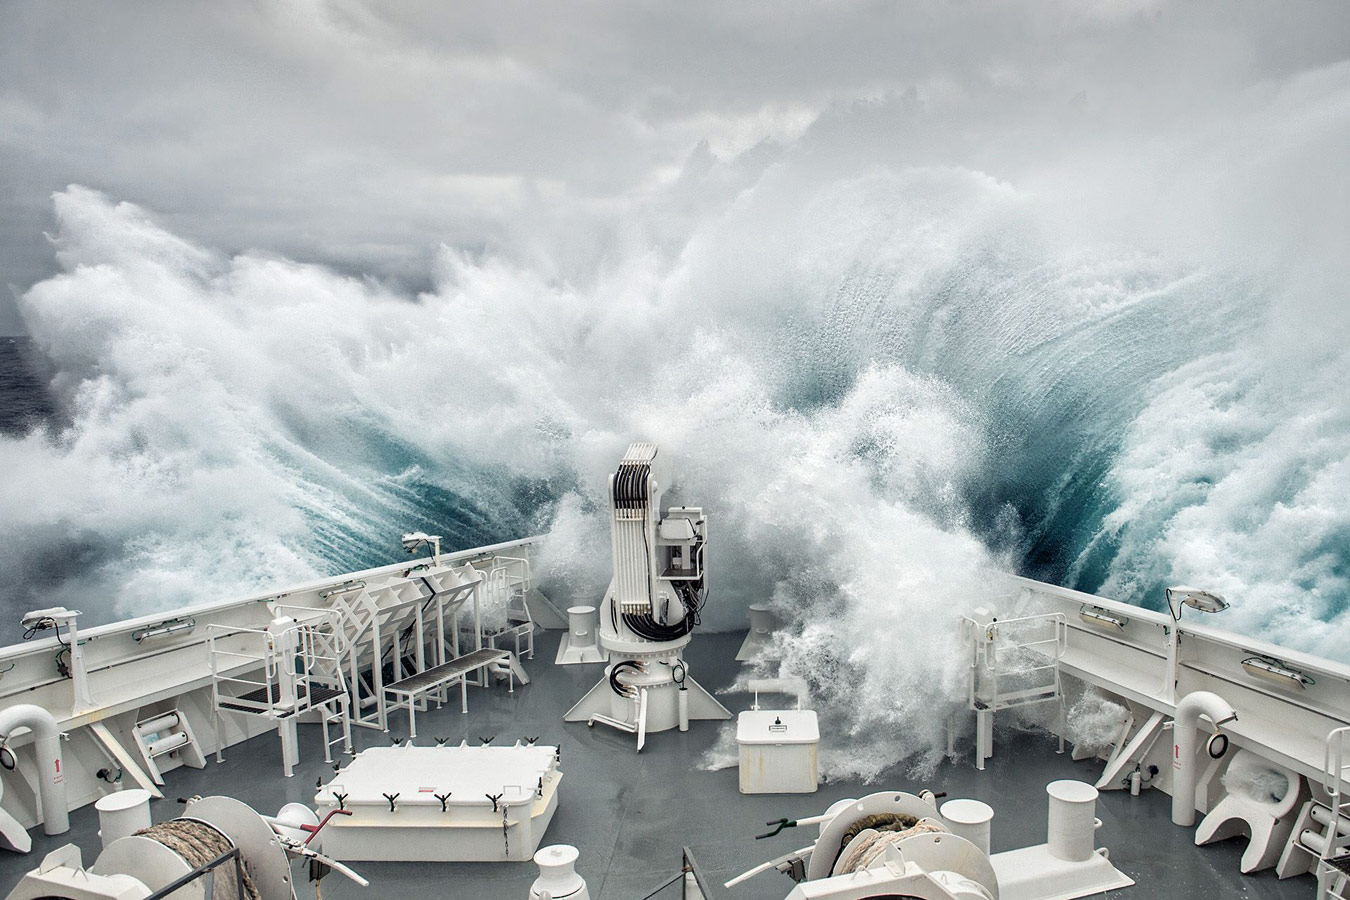 Волна, © Лорейн Турси, Франция, 3 место, Фотоконкурс Siena